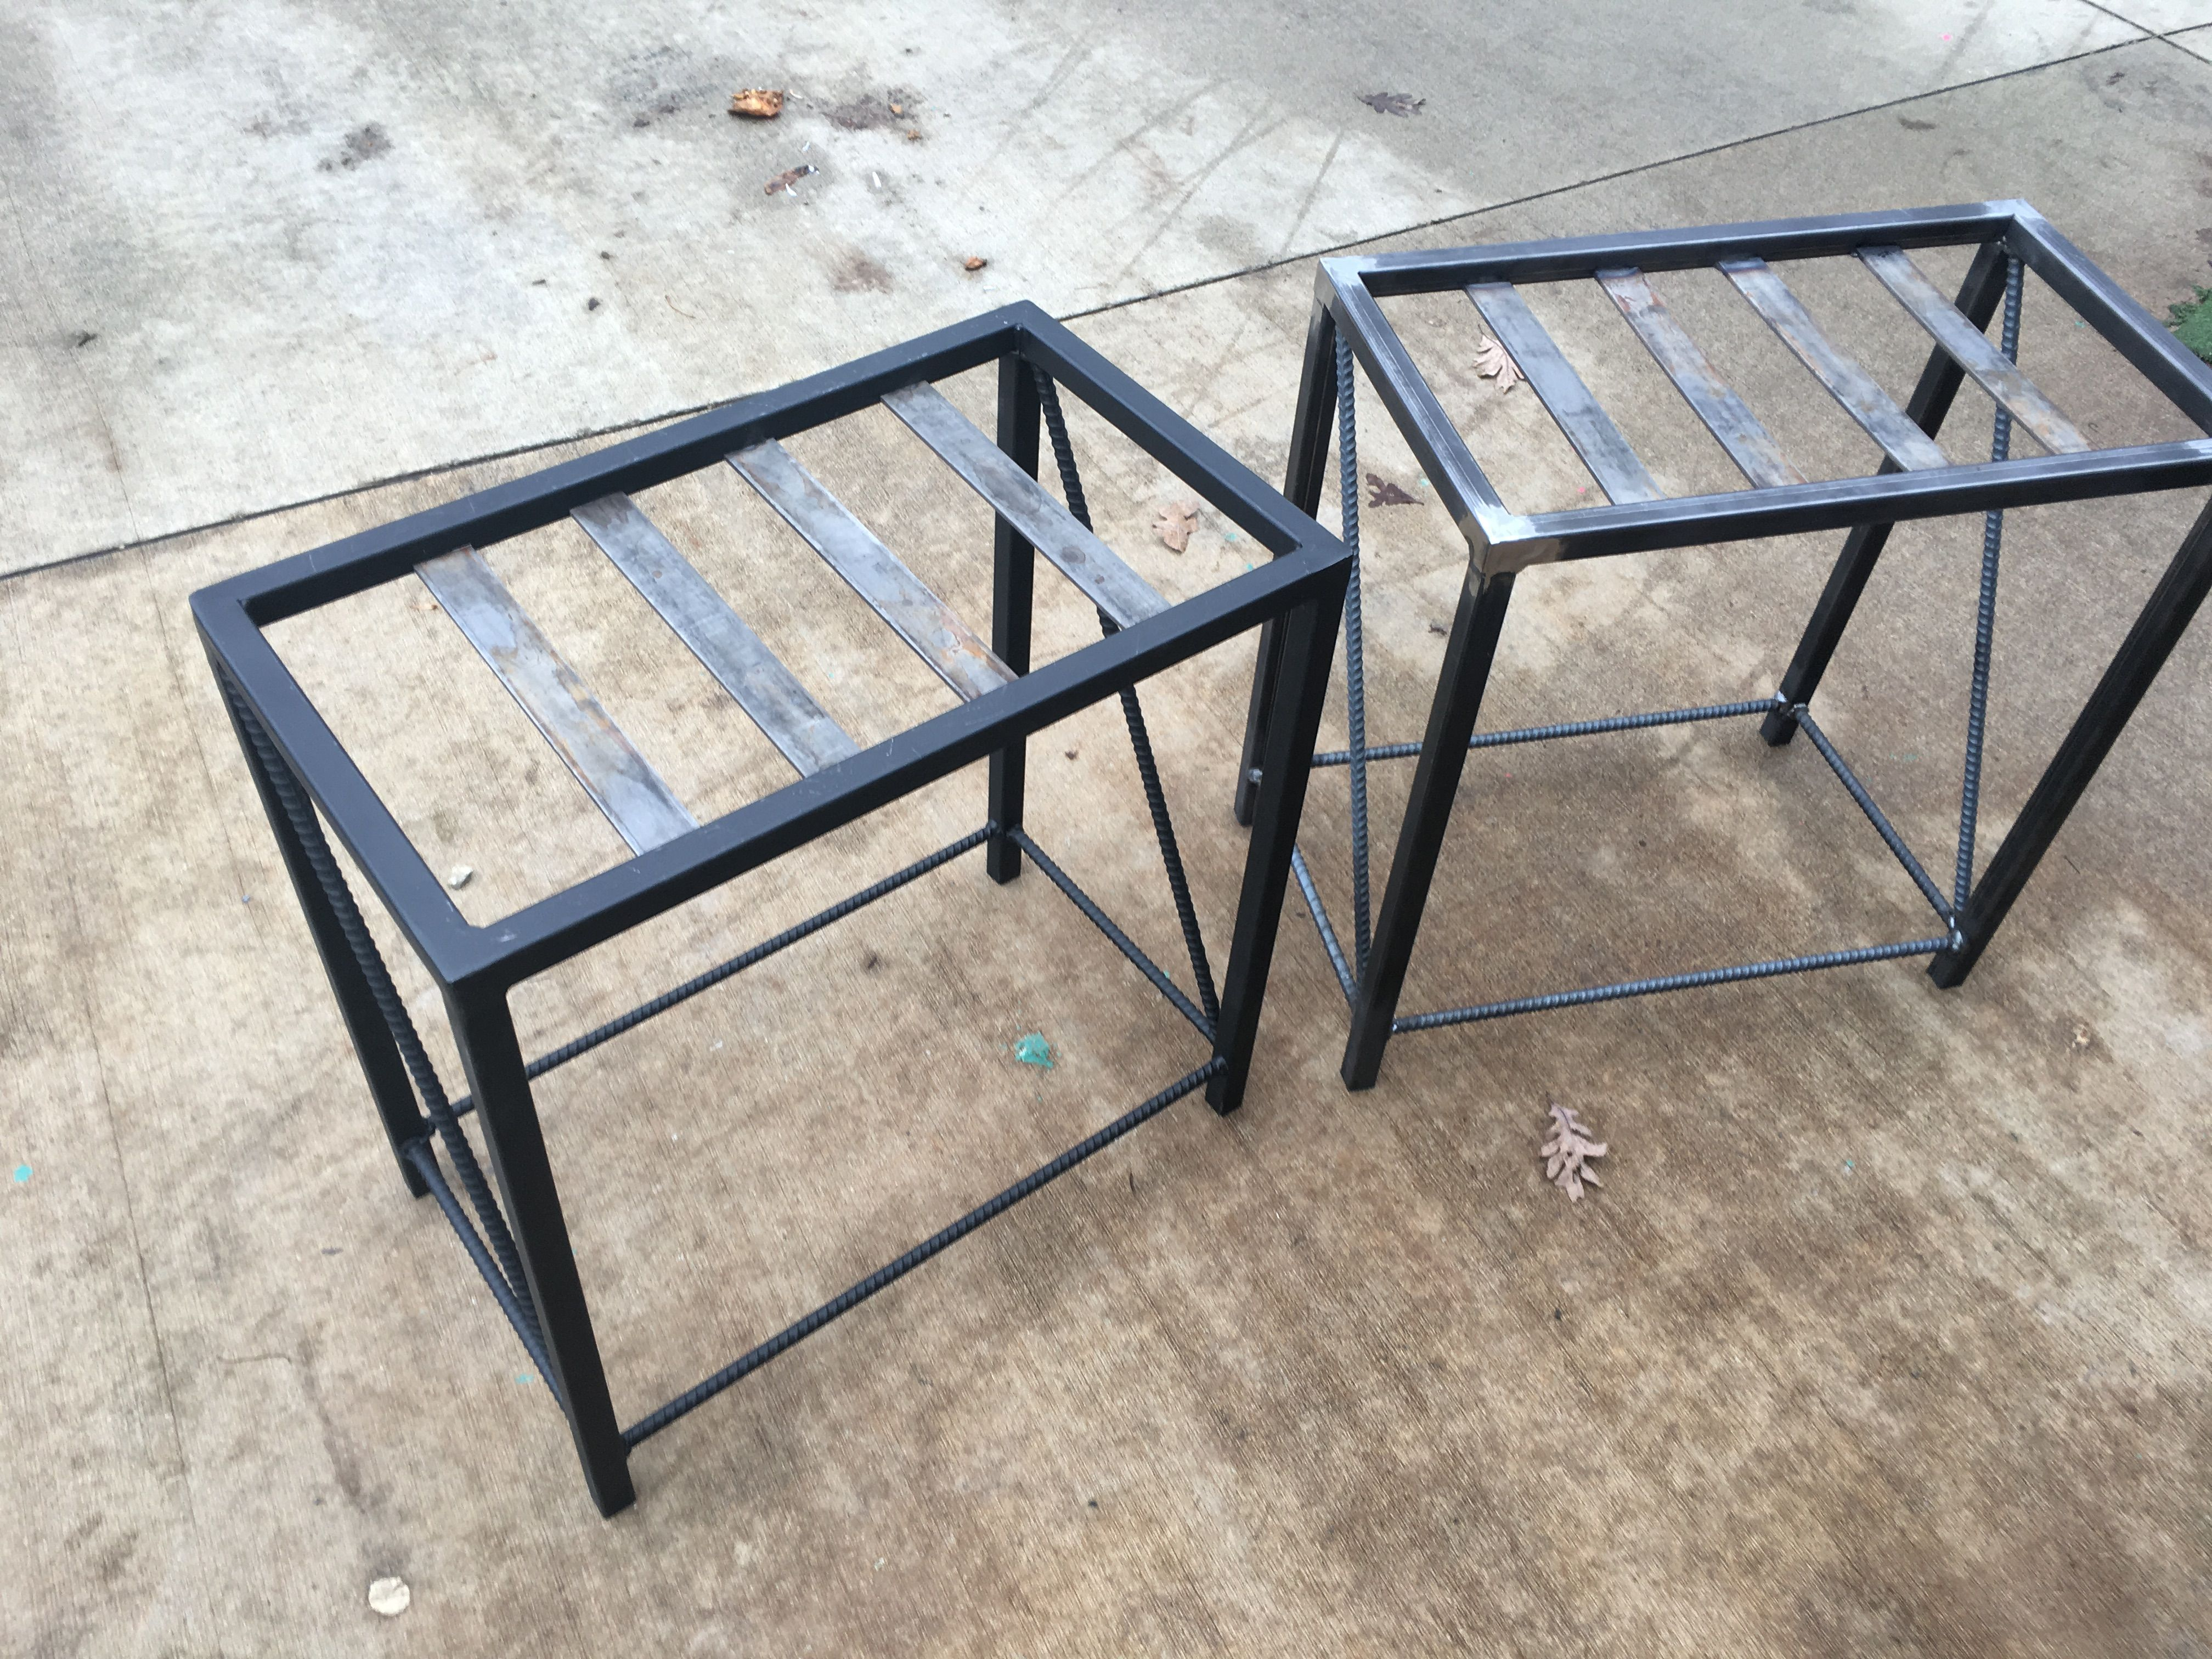 Awesome Tubular Steel Flat Bar And Rebar End Table Frames Wood Ibusinesslaw Wood Chair Design Ideas Ibusinesslaworg